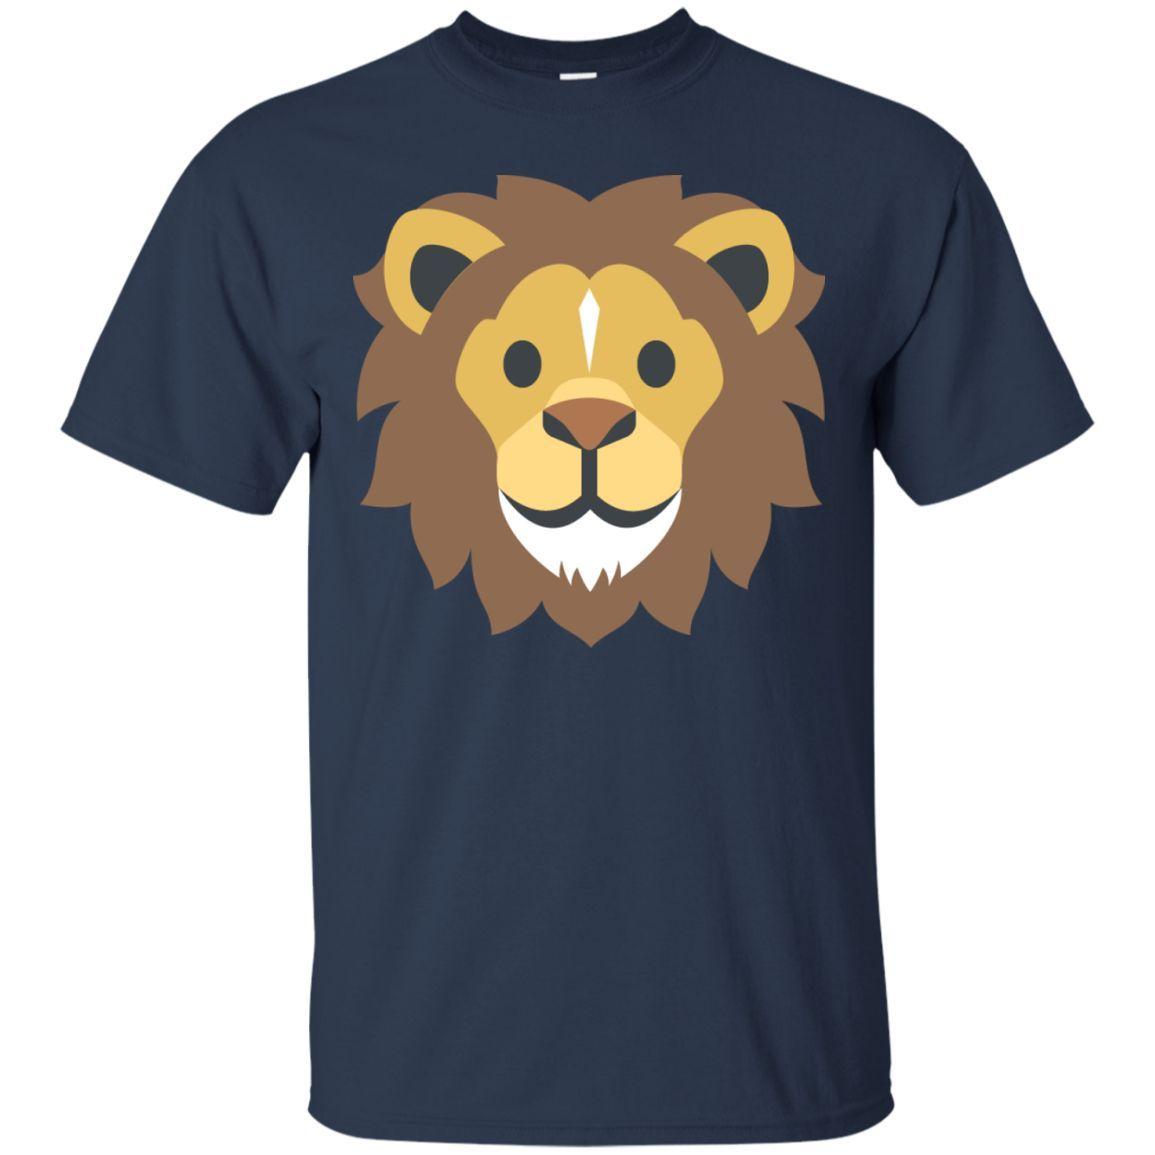 Lion Face Emoji Unisex T-Shirt